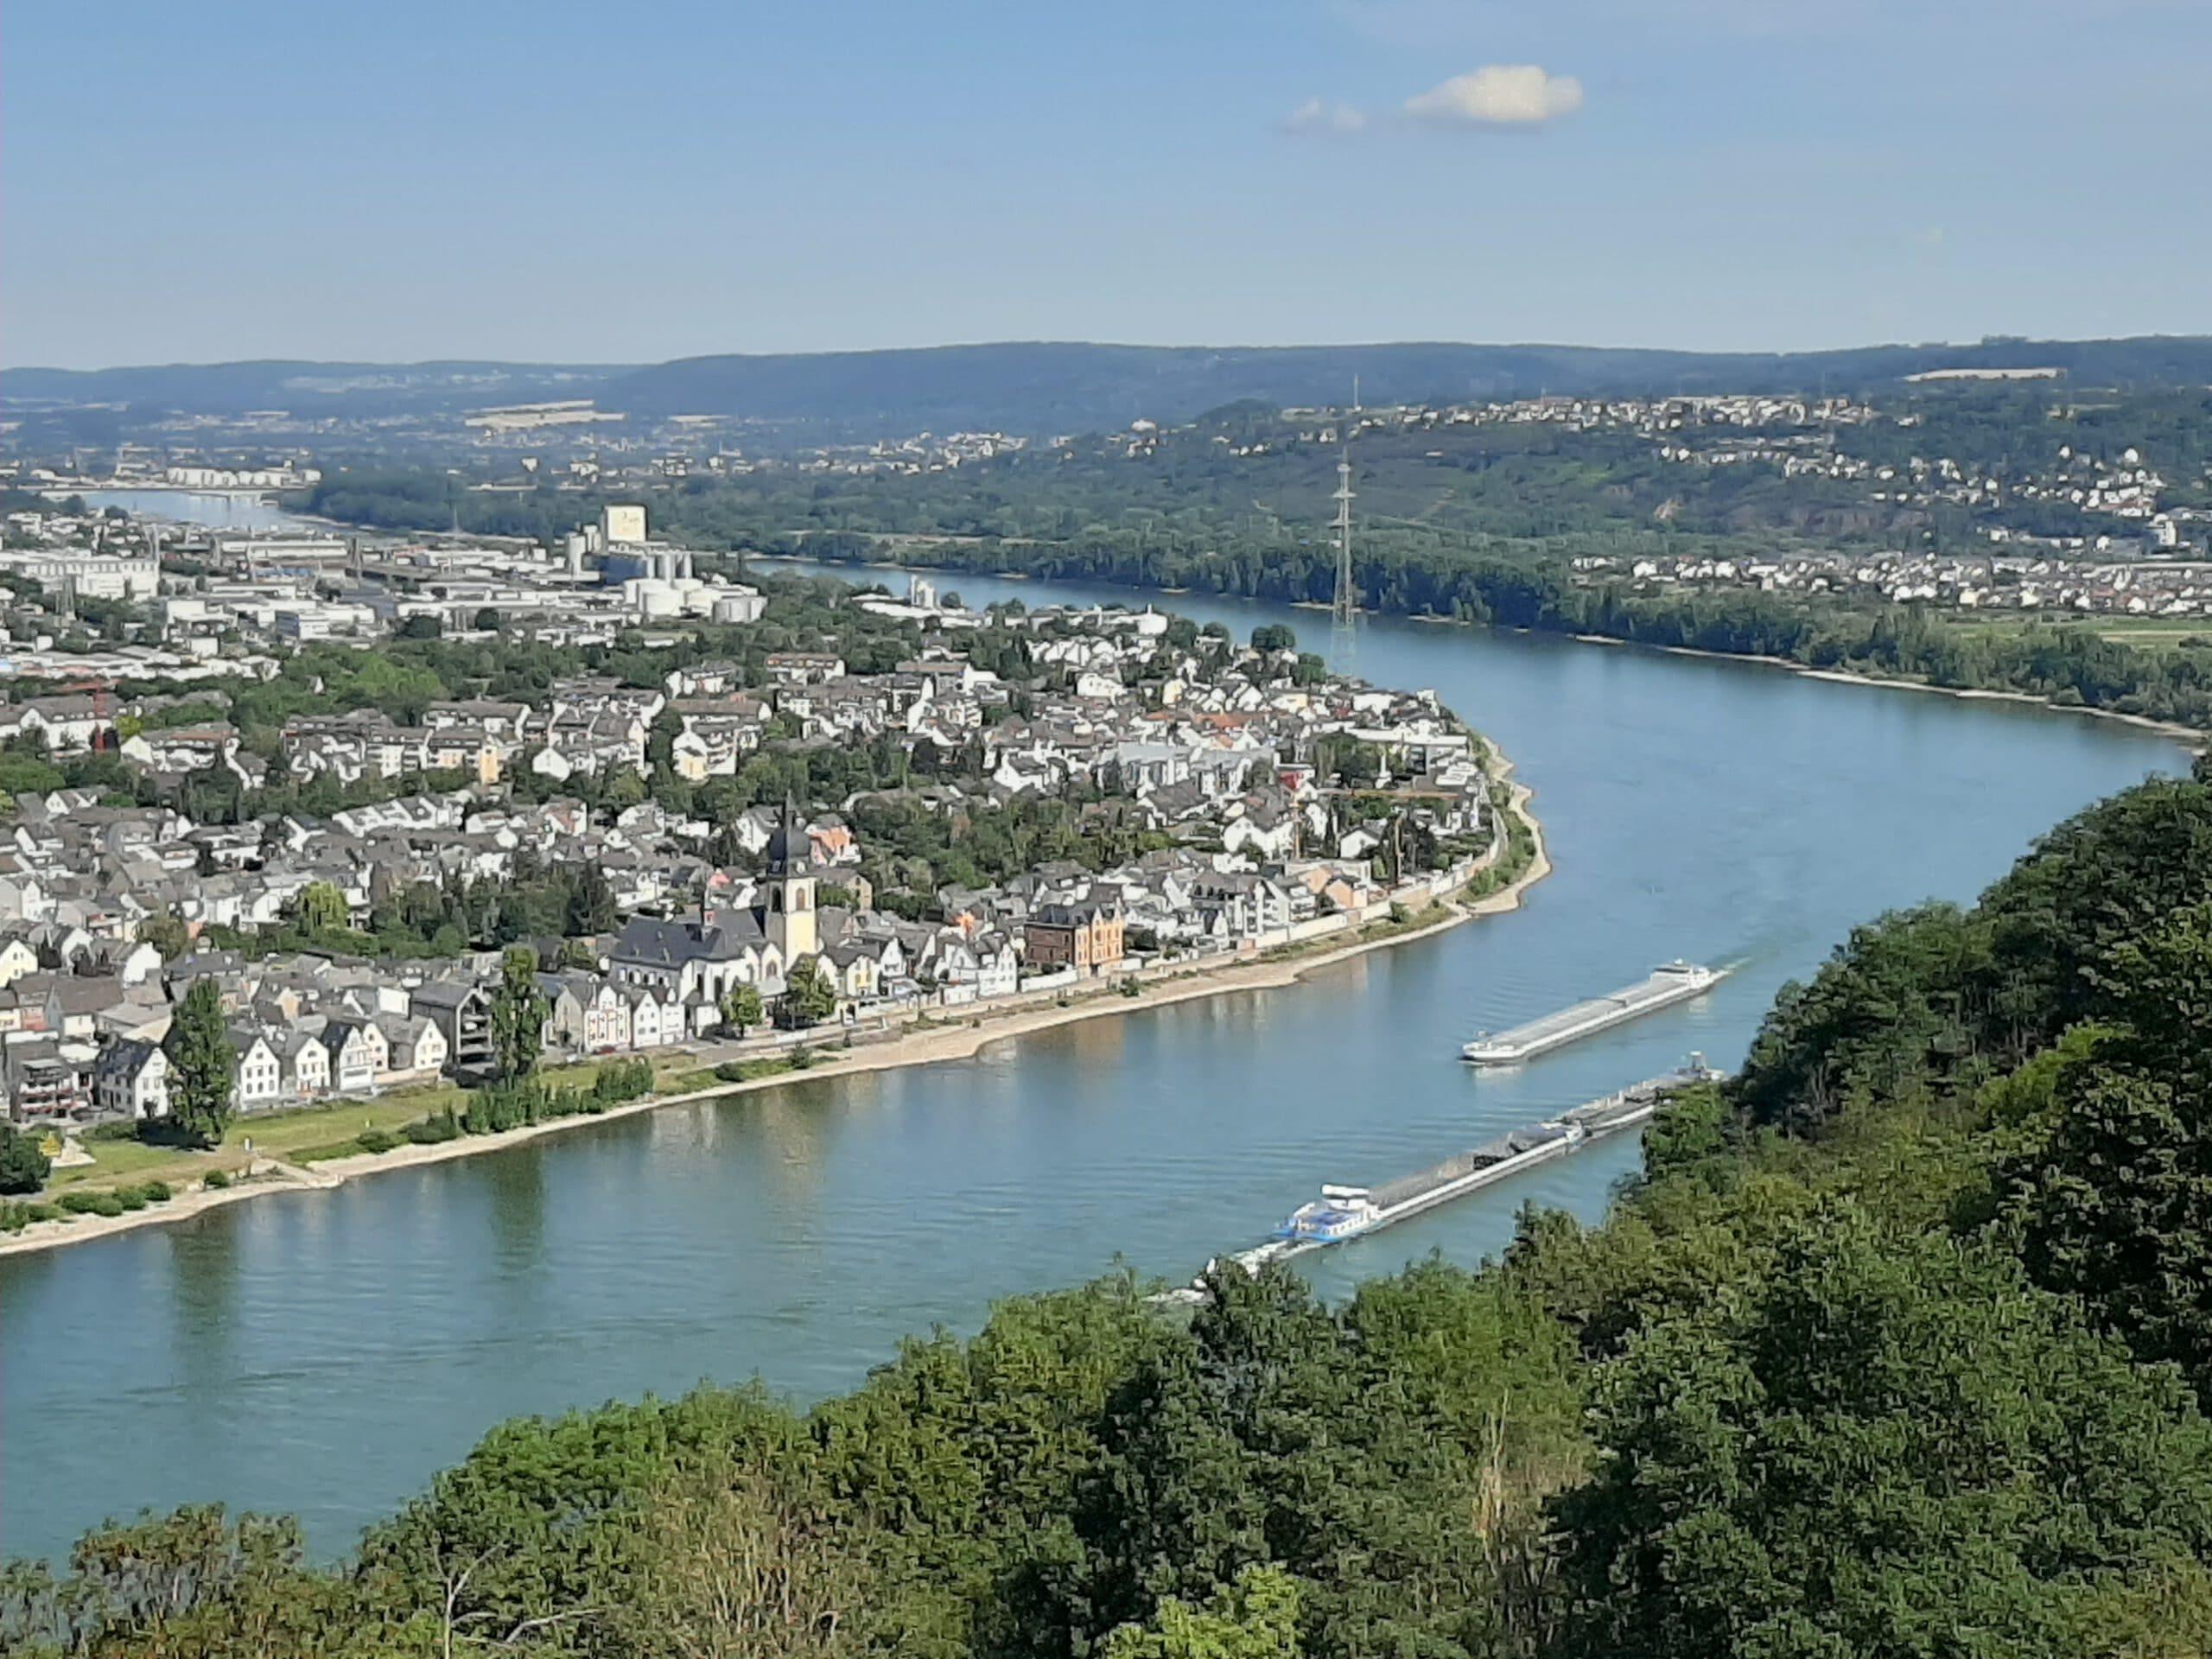 Viva-Cruises-Viva-Inspire-rivercruise-schip-uitzicht-rijn